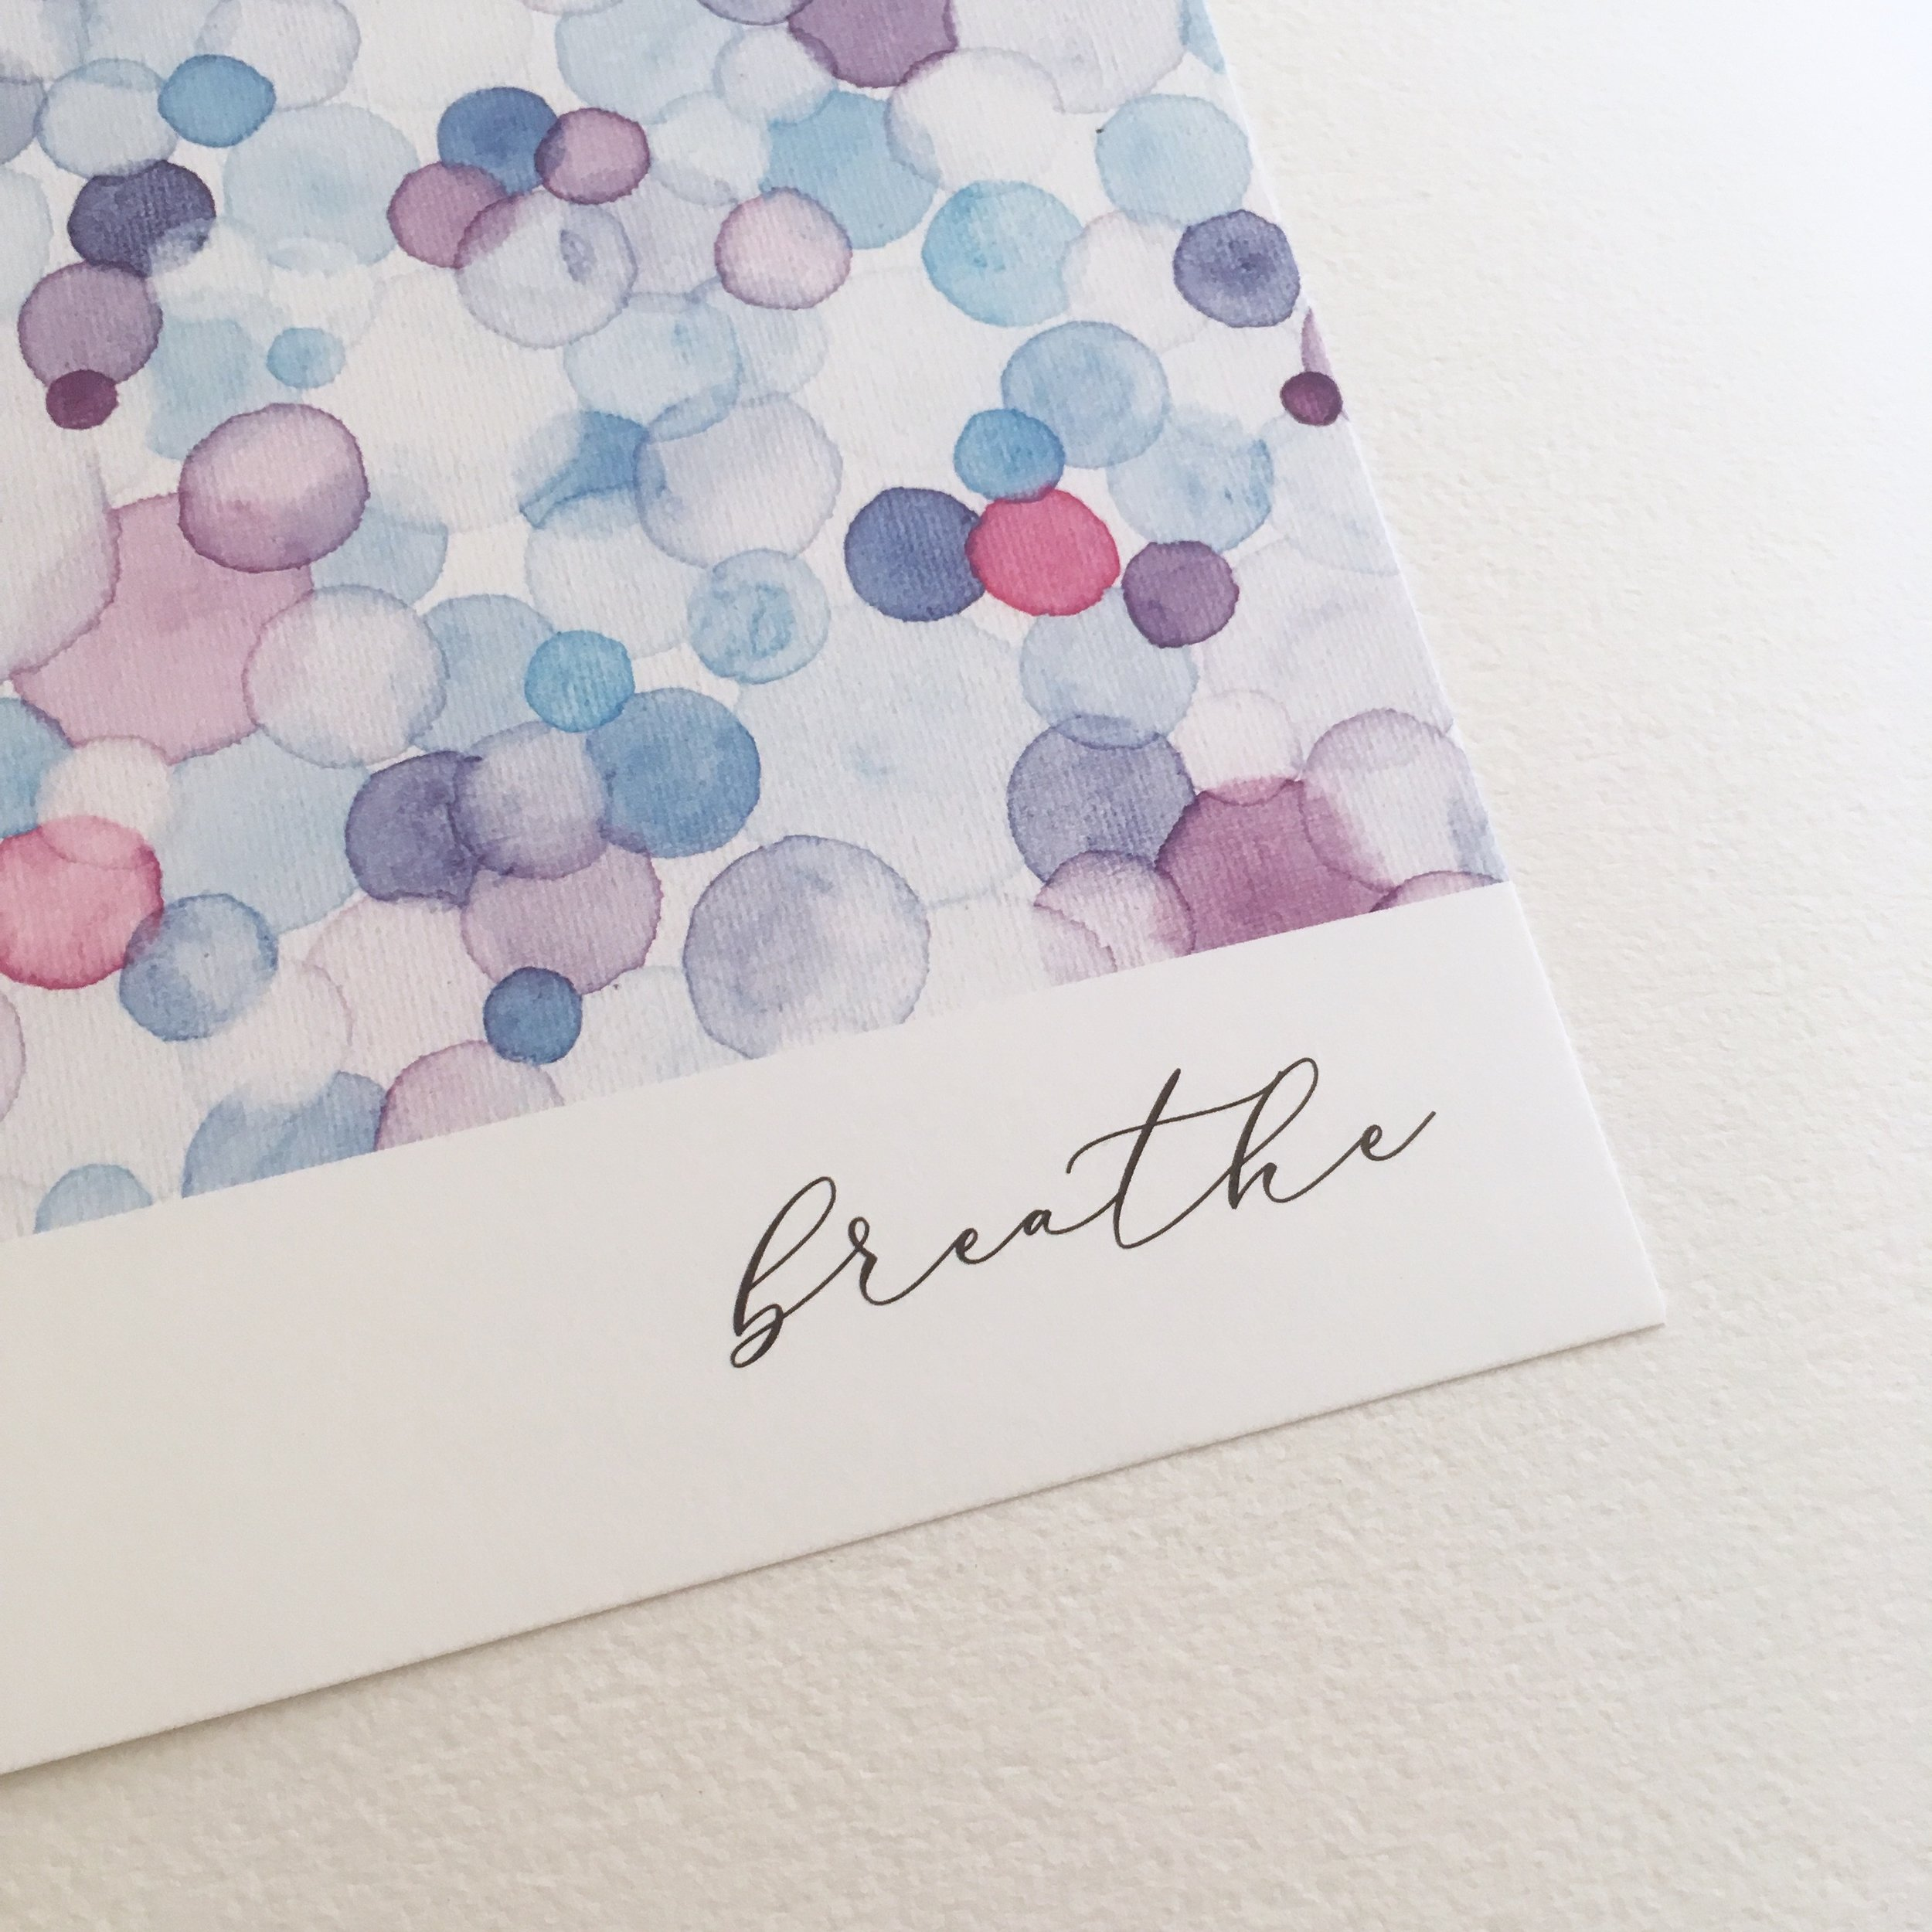 breathe_bubbles_jsprintsiii.jpg